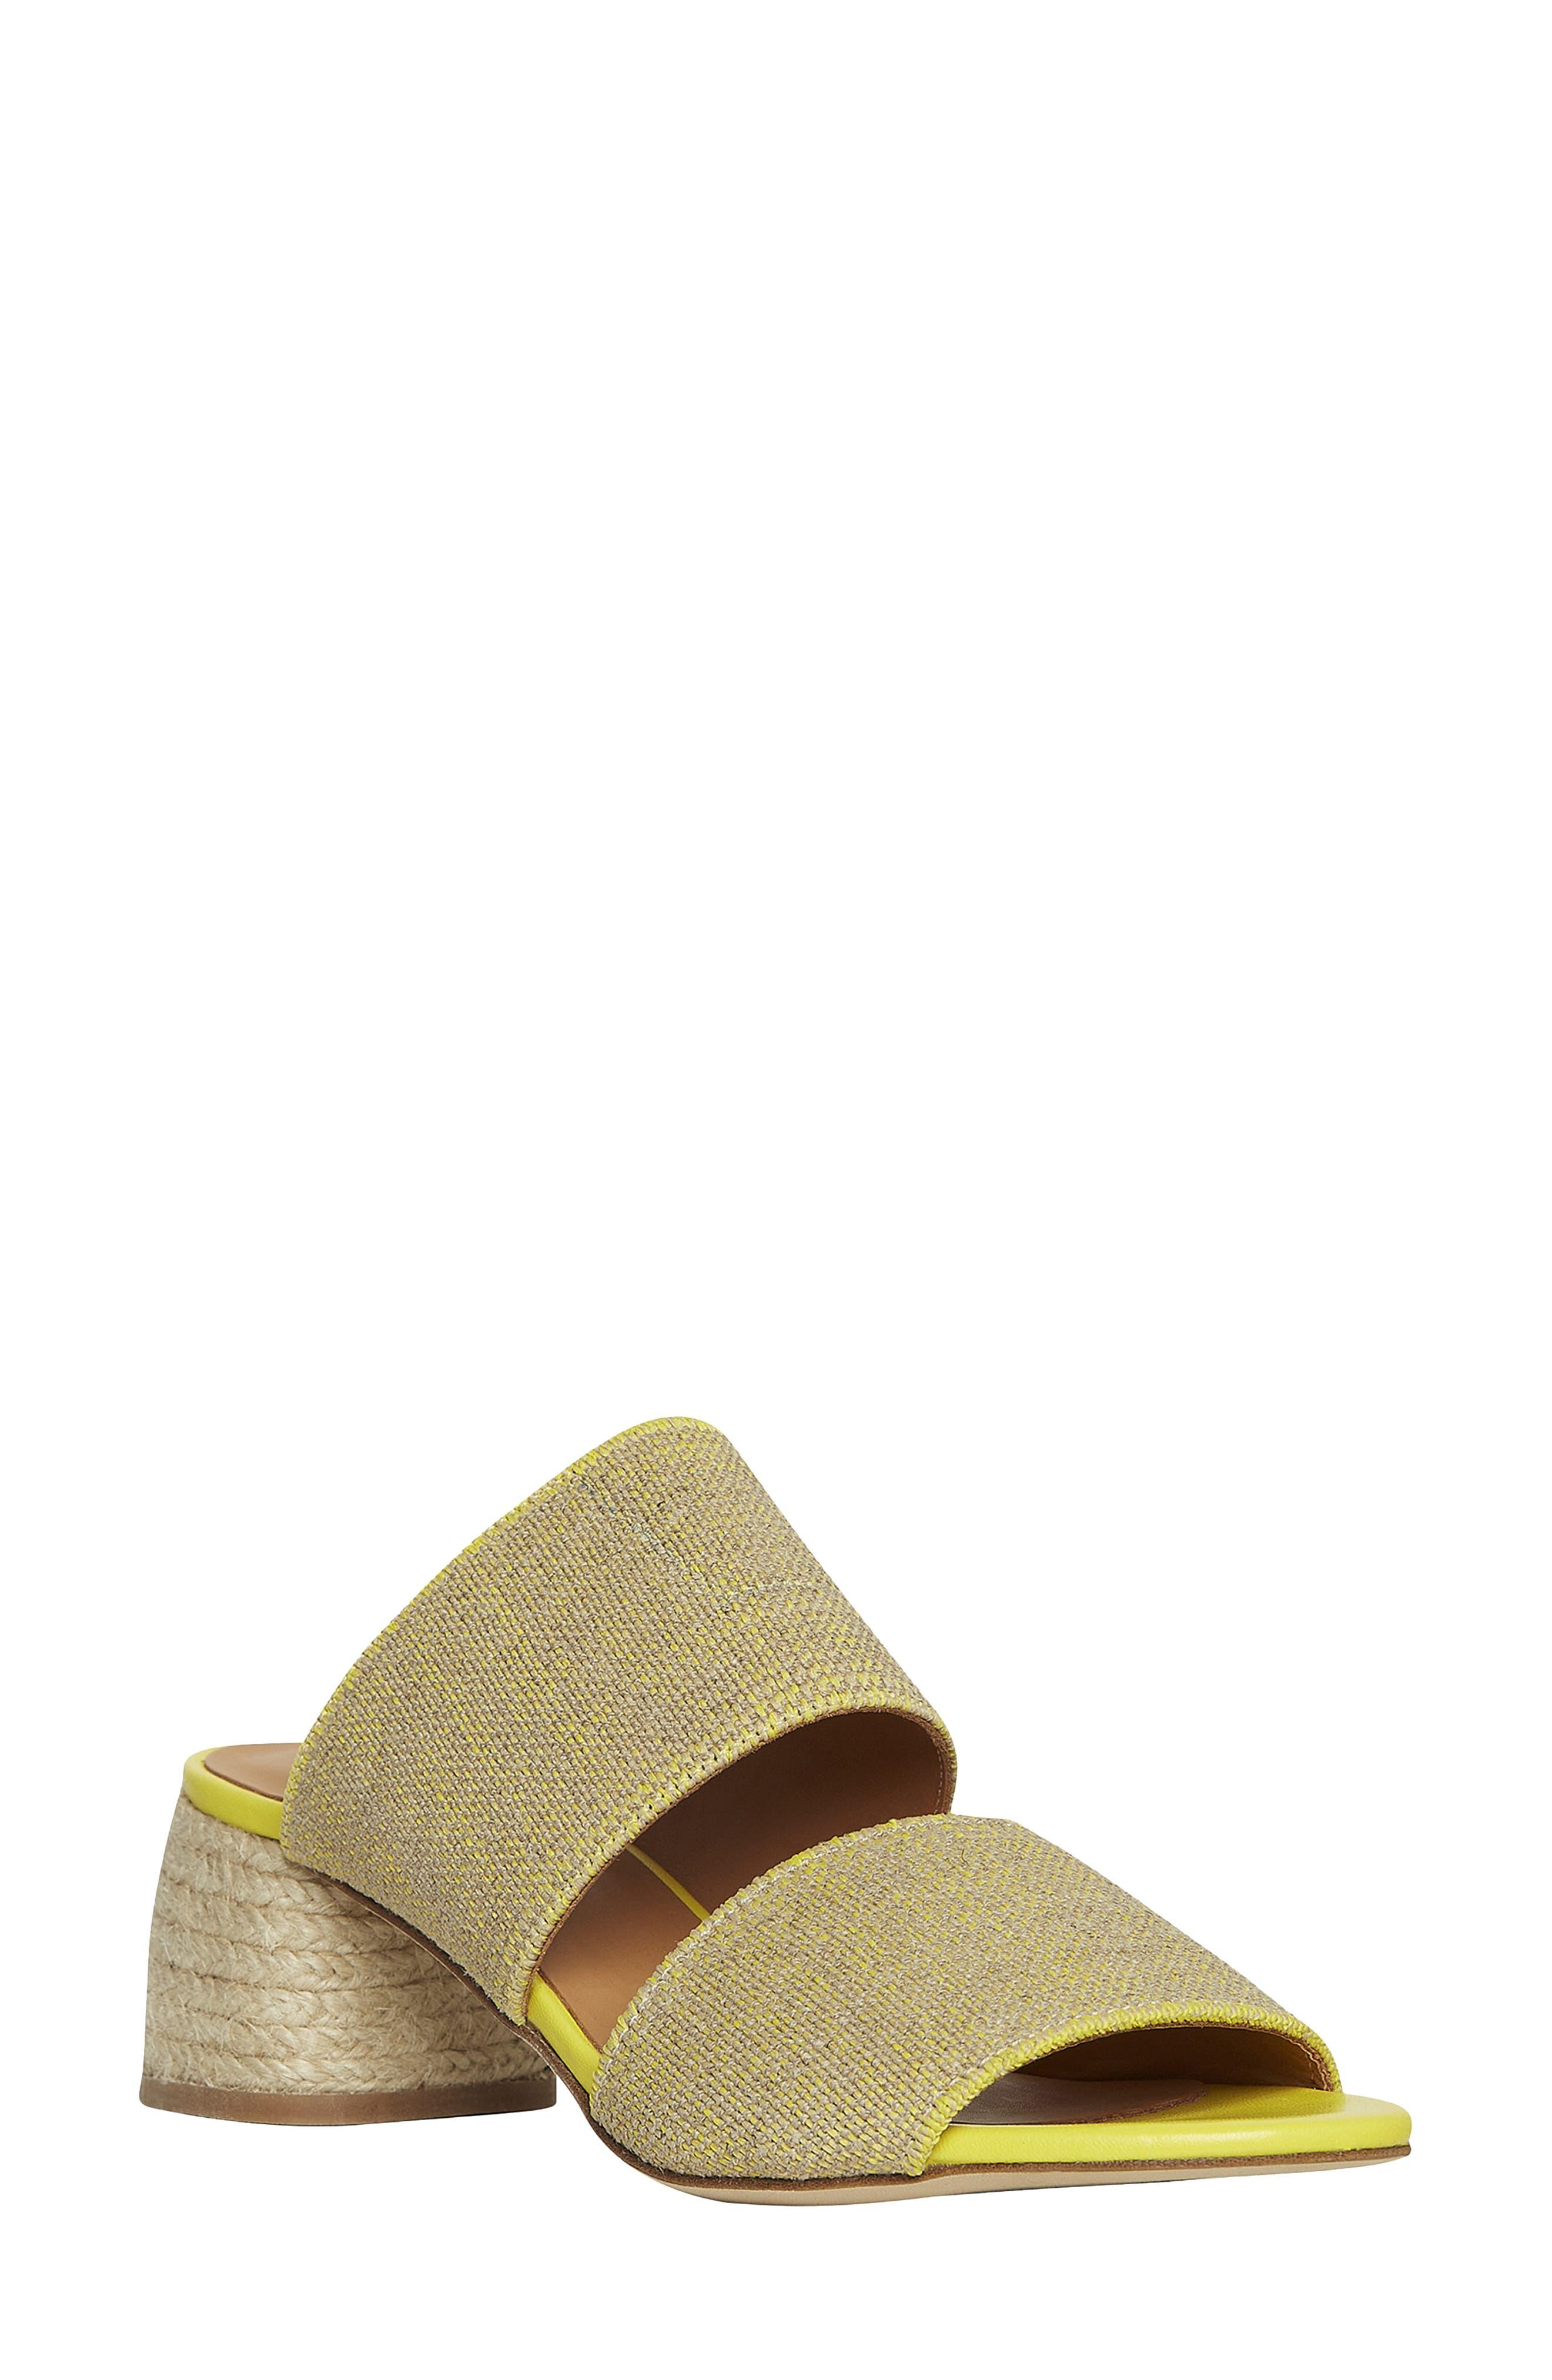 Cayssie Slide Sandal